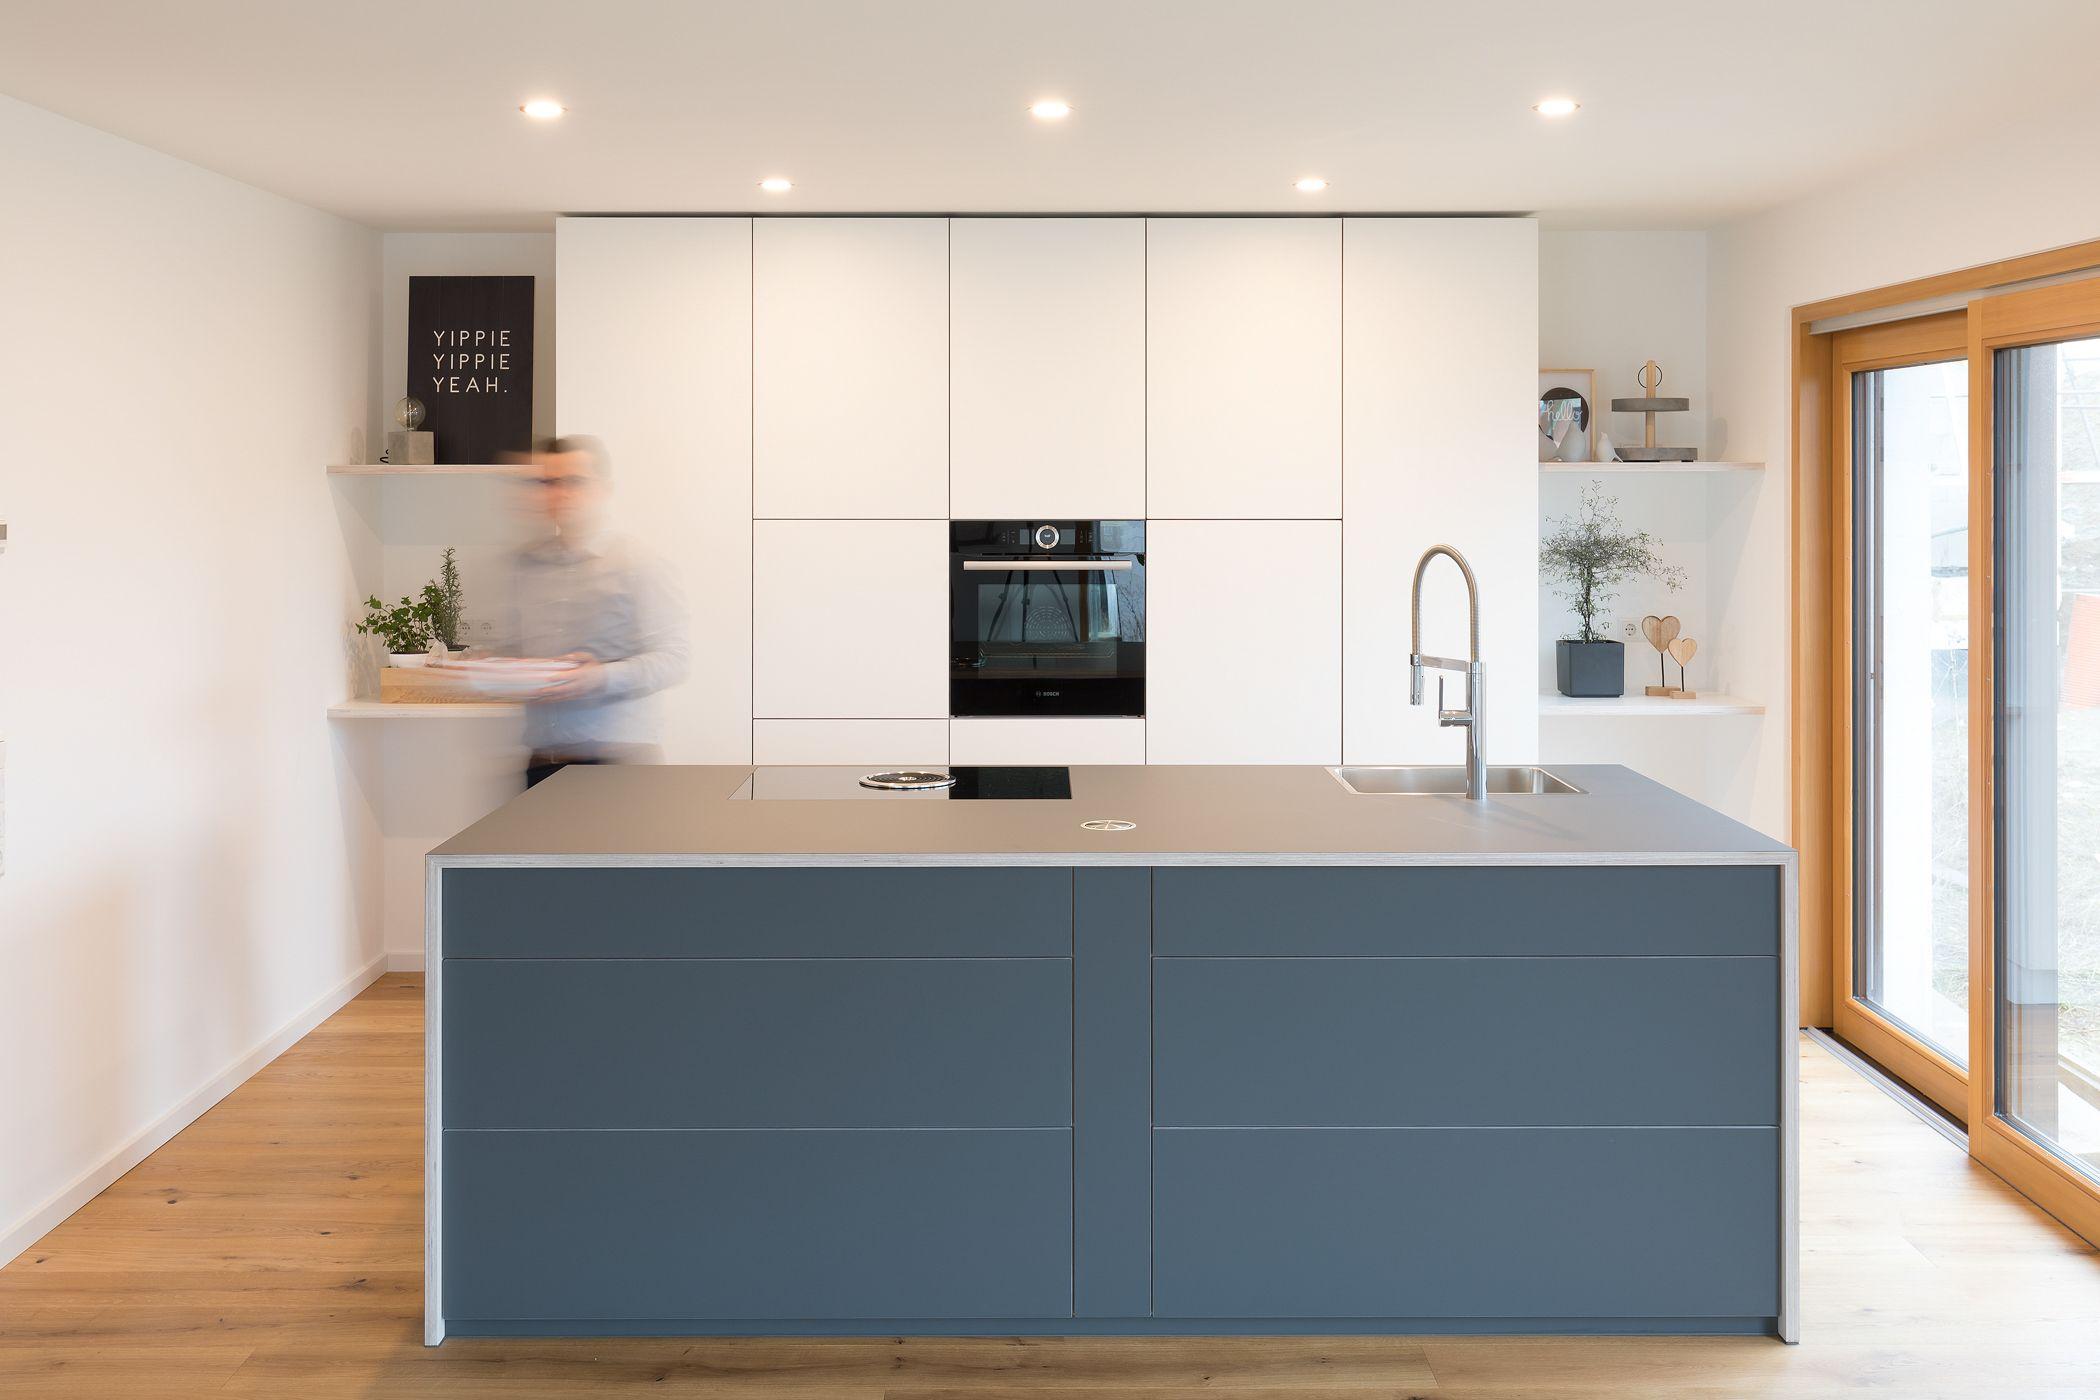 Full Size of Kcheninsel Kochinsel Grau Designerkche Design Modern Wohnzimmer Kücheninsel